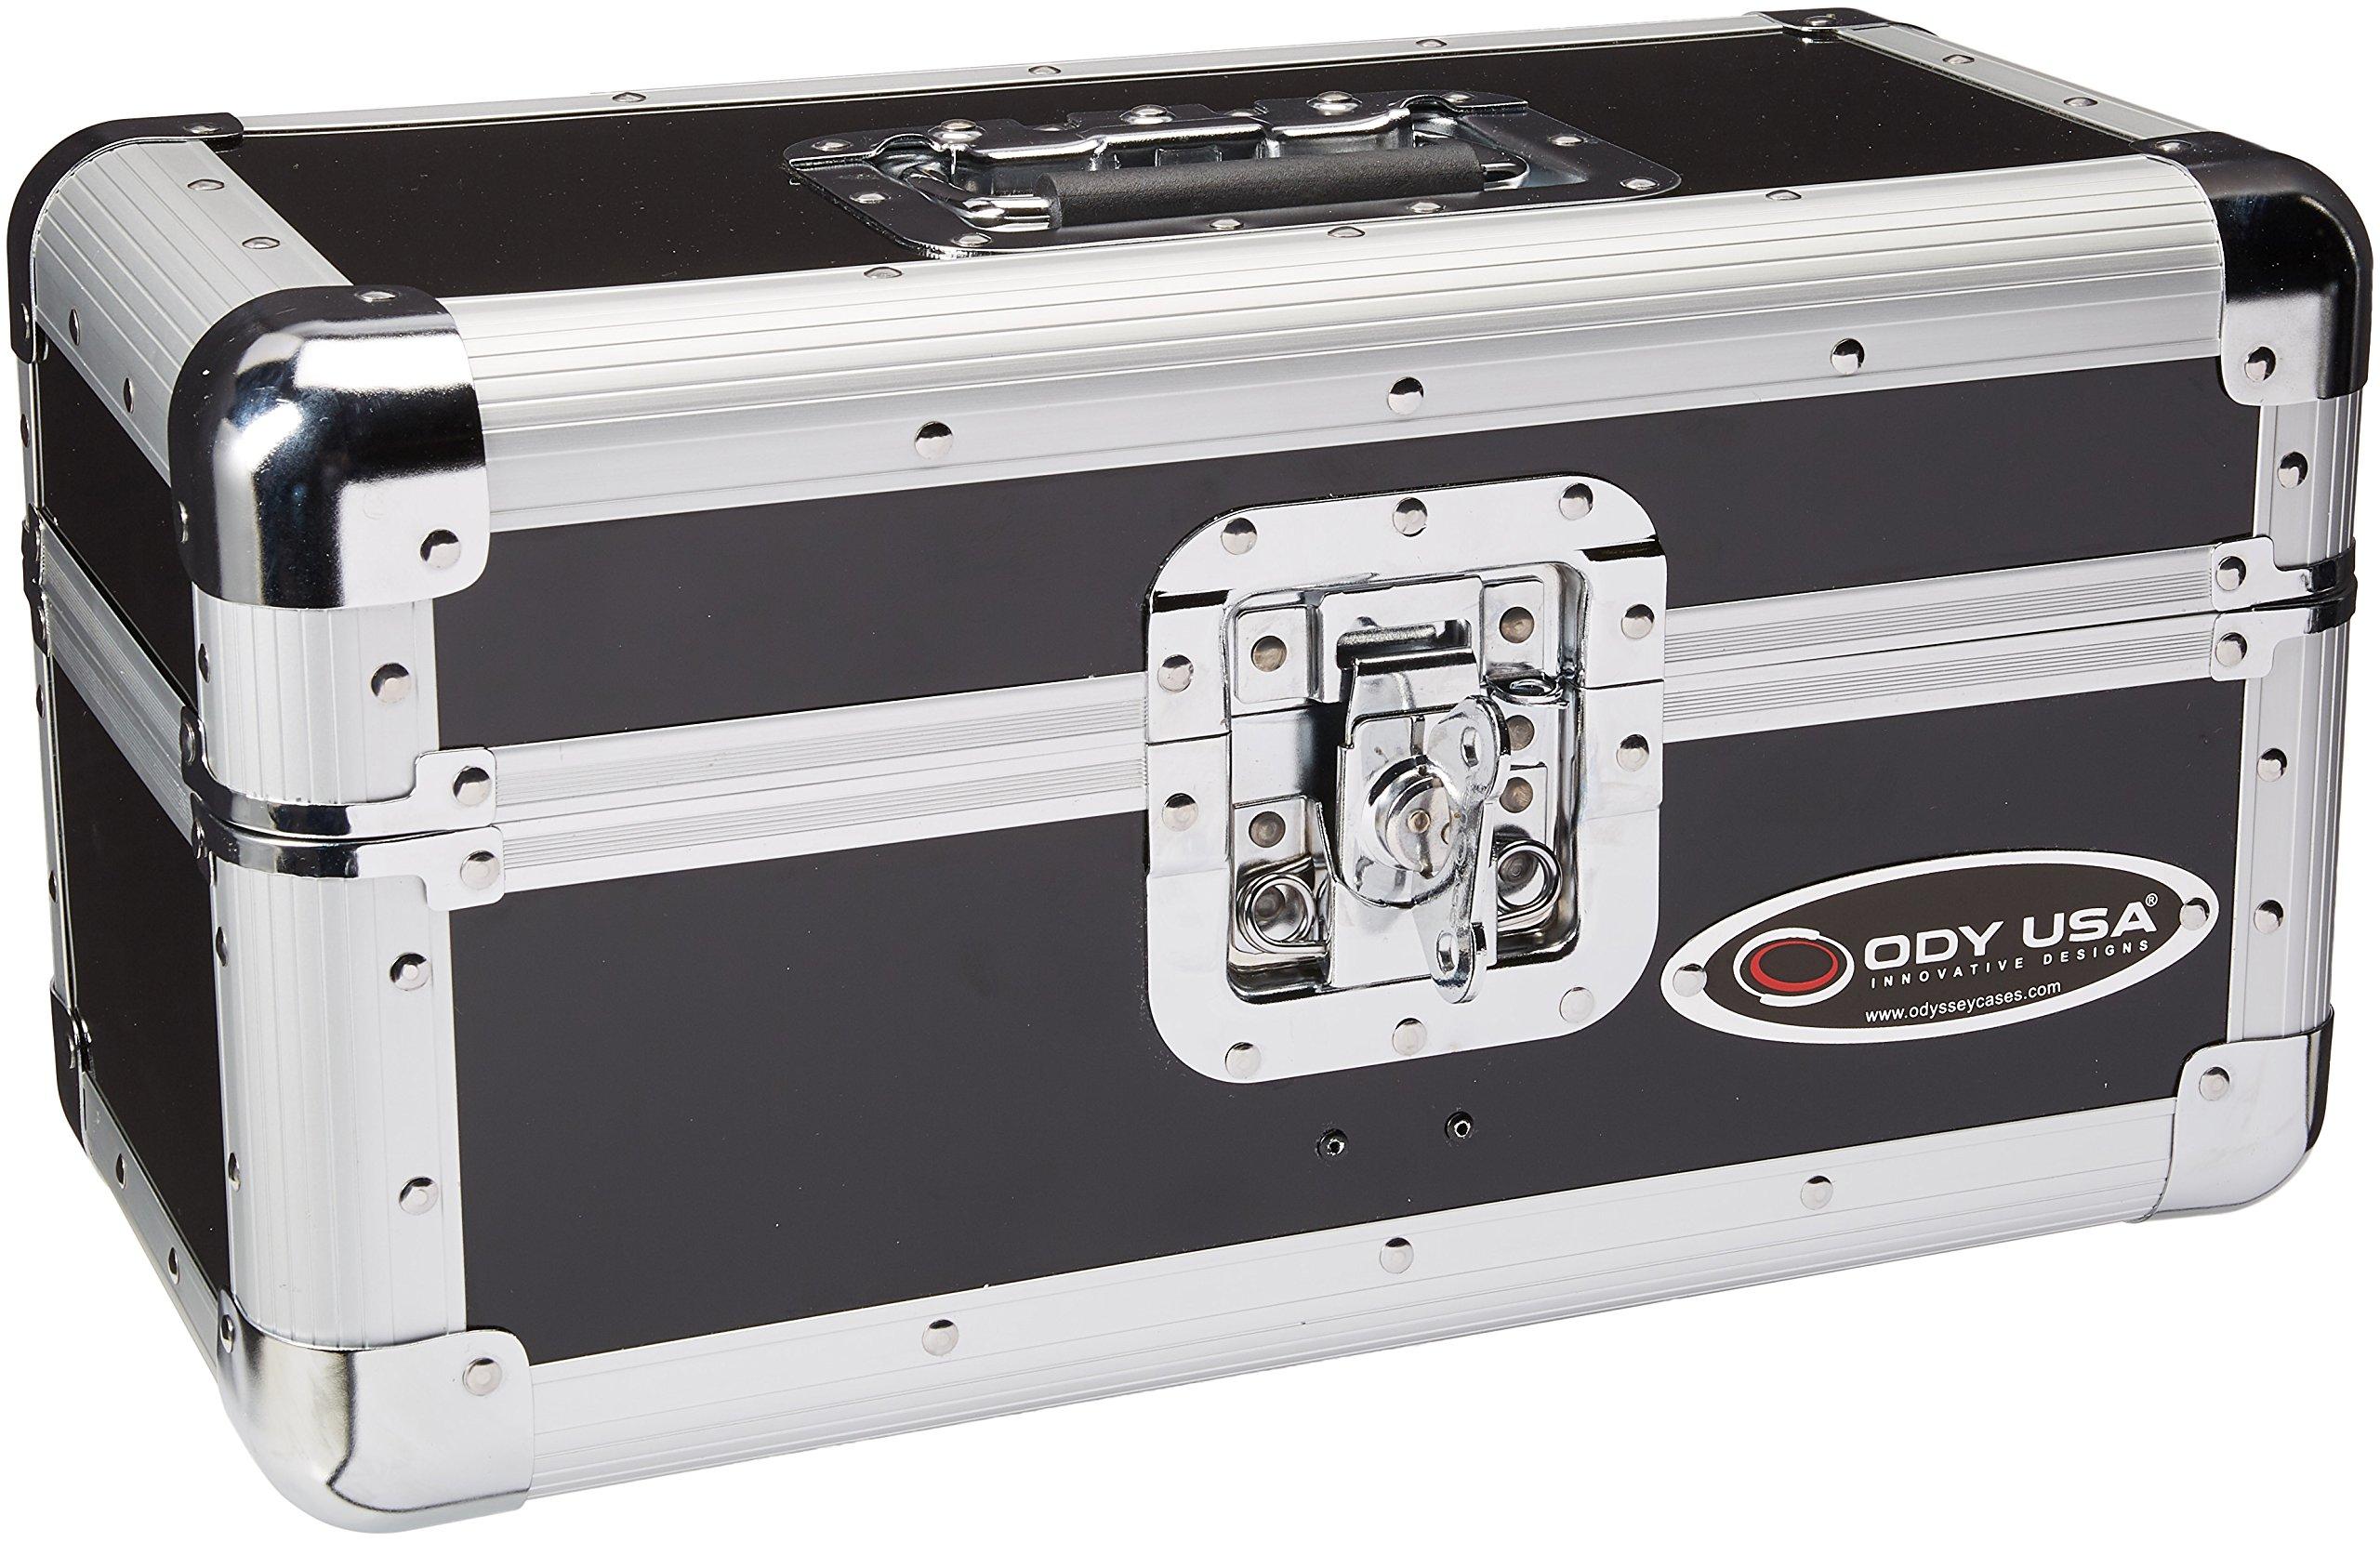 Odyssey K45120BLK Krom Utility/Record Case, Black by ODYSSEY